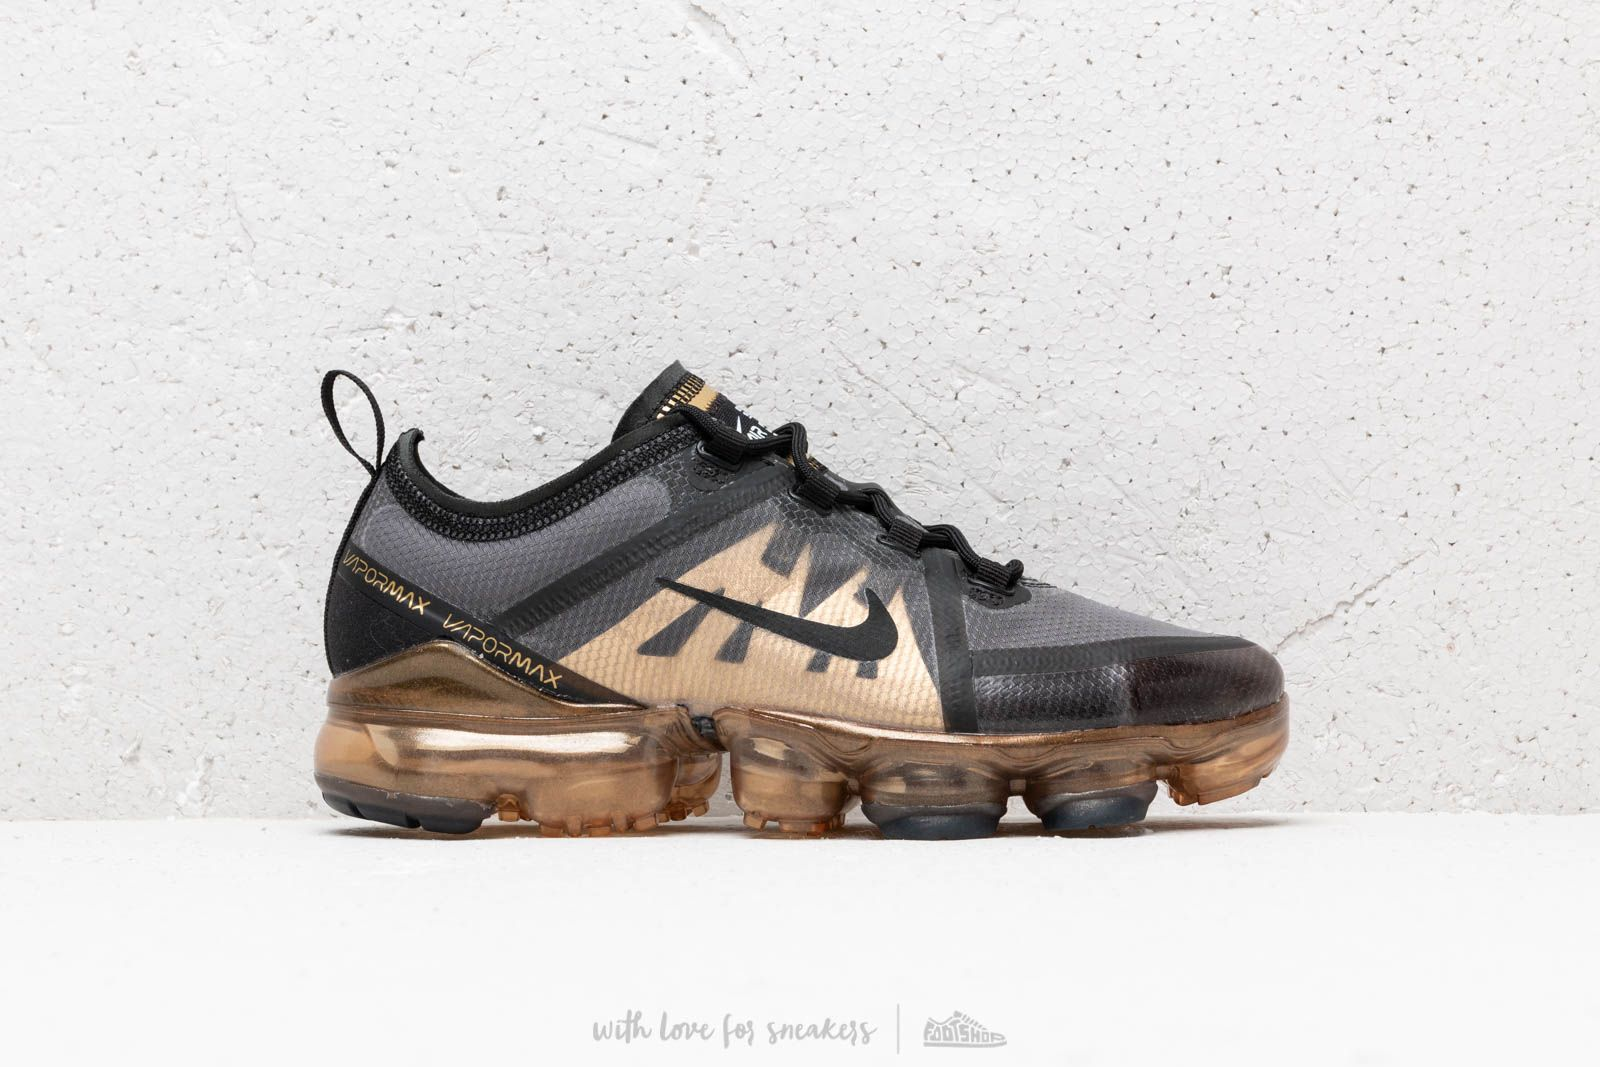 3aab7e1b2b3d Nike Air Vapormax 2019 (GS) Black  Black-Metallic Gold at a great